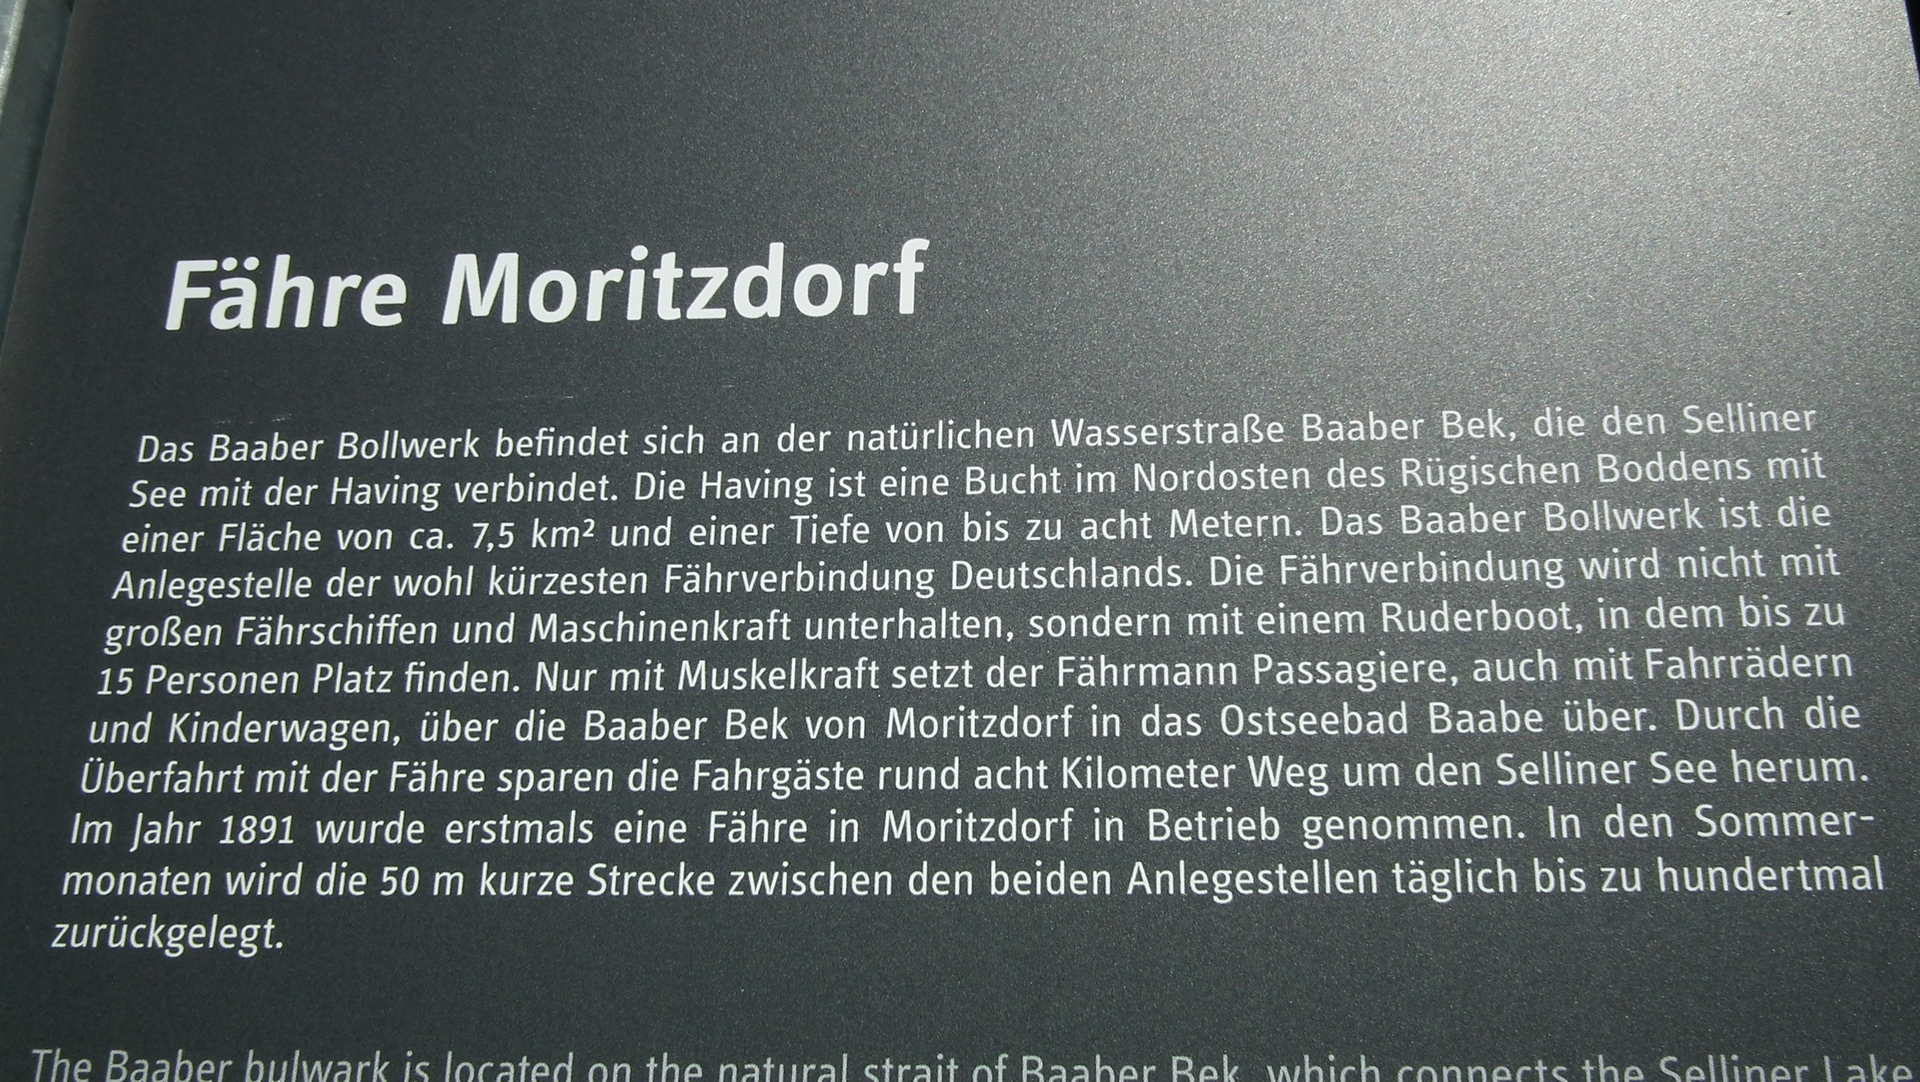 Fähre Moritzdorf